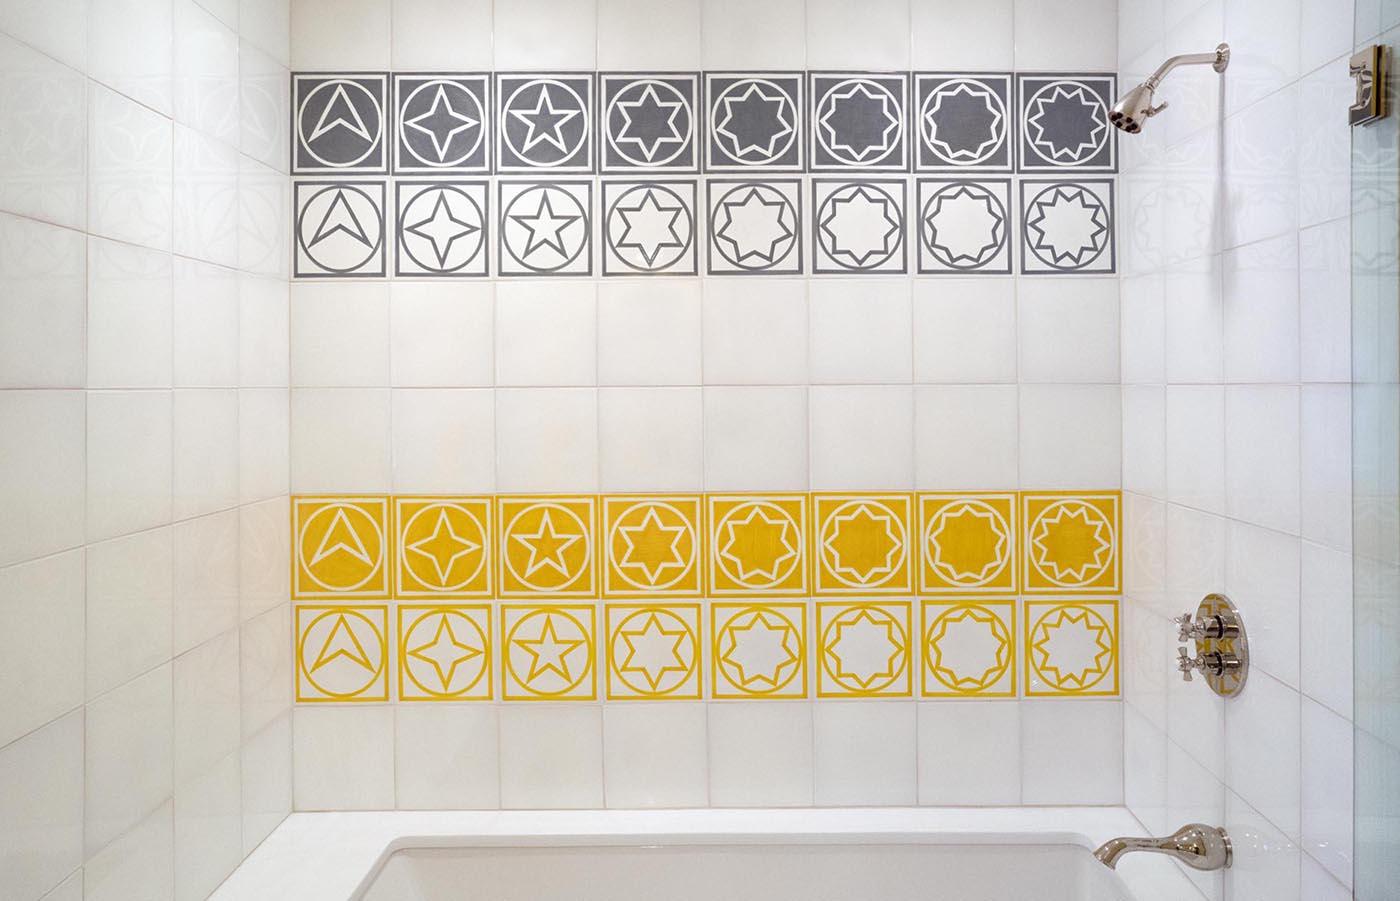 Special Order Decorative Tiles - Lewitt Studio